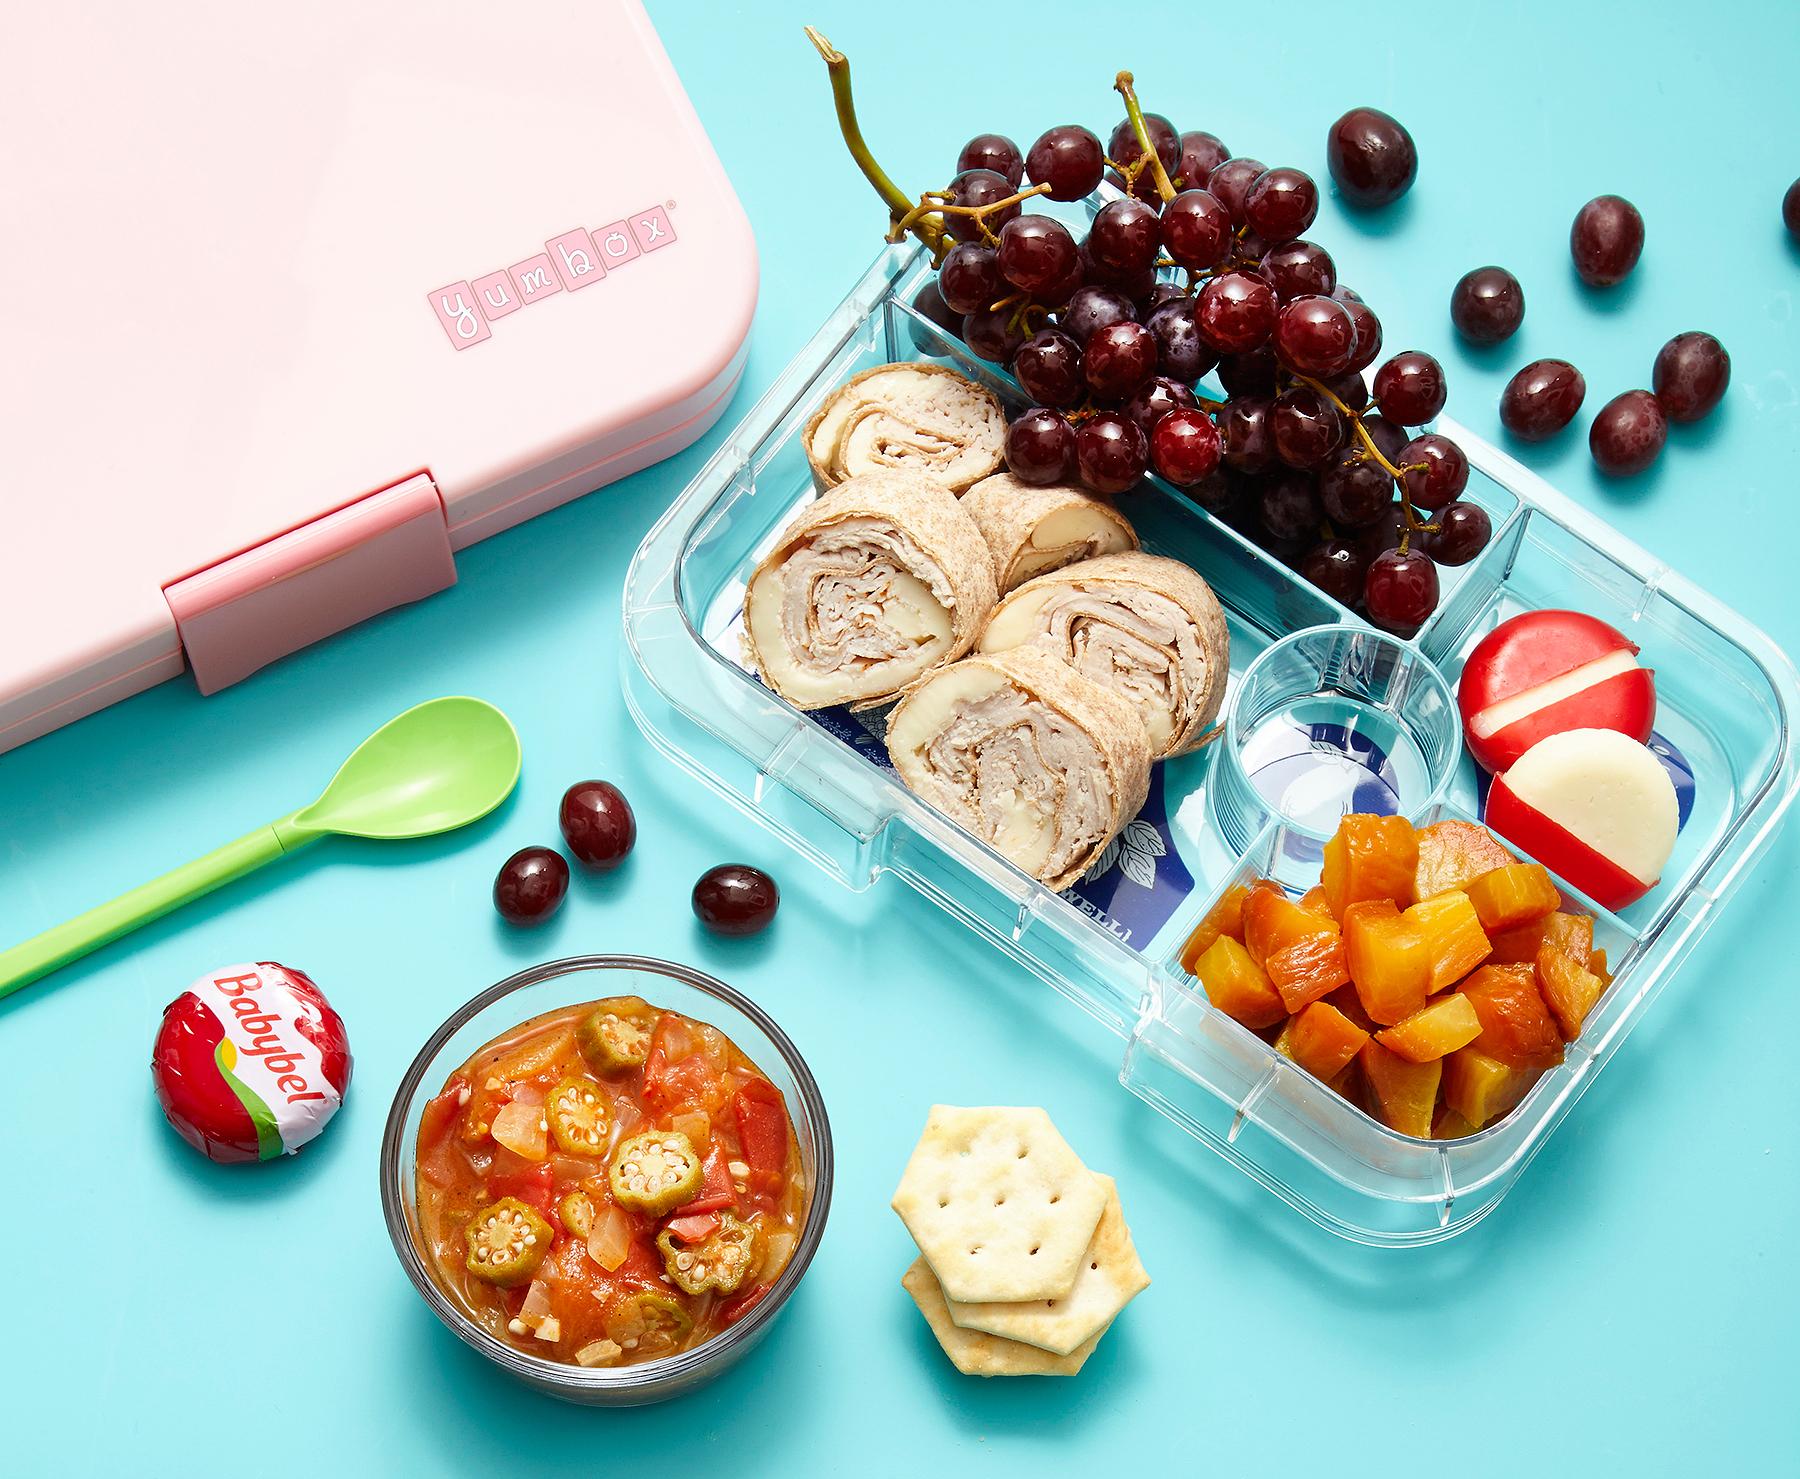 Haylie Duff's lunchbox